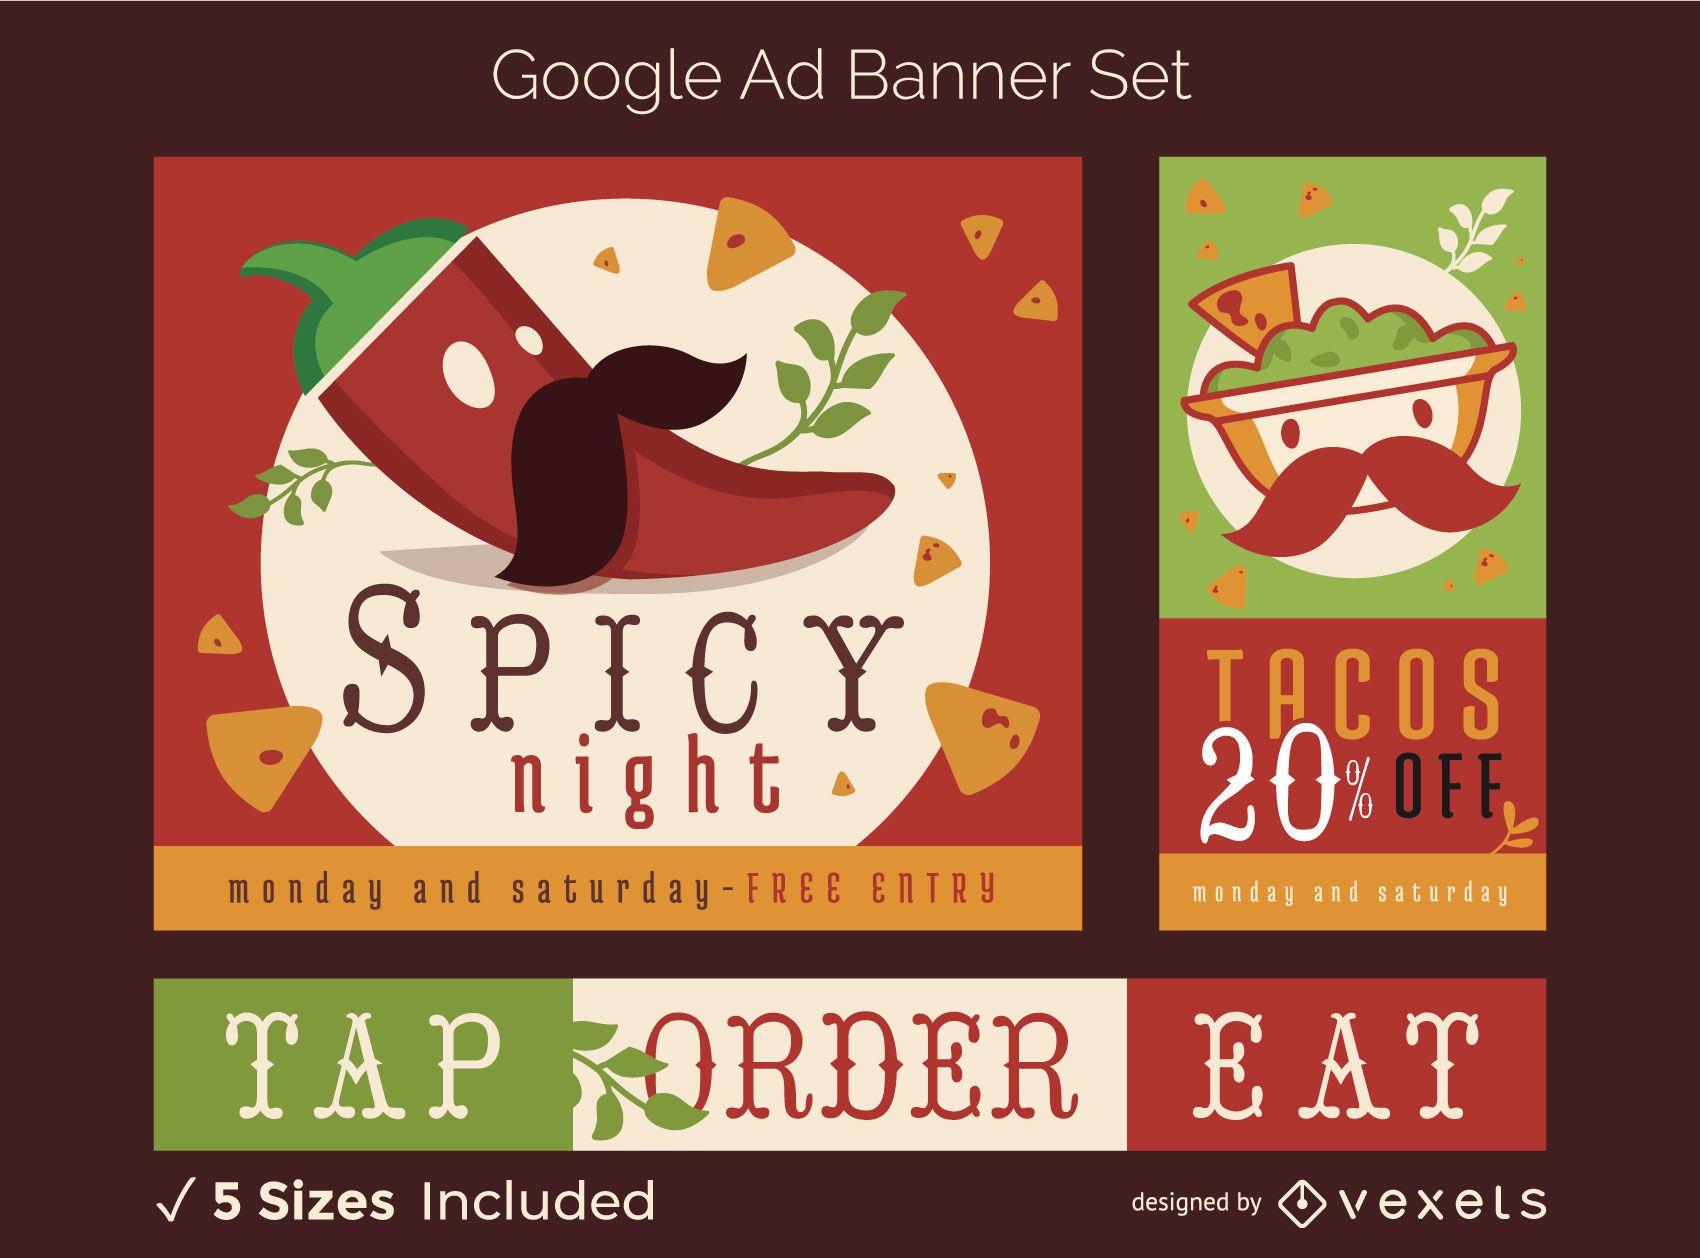 Conjunto de banners publicitarios de Google de comida mexicana